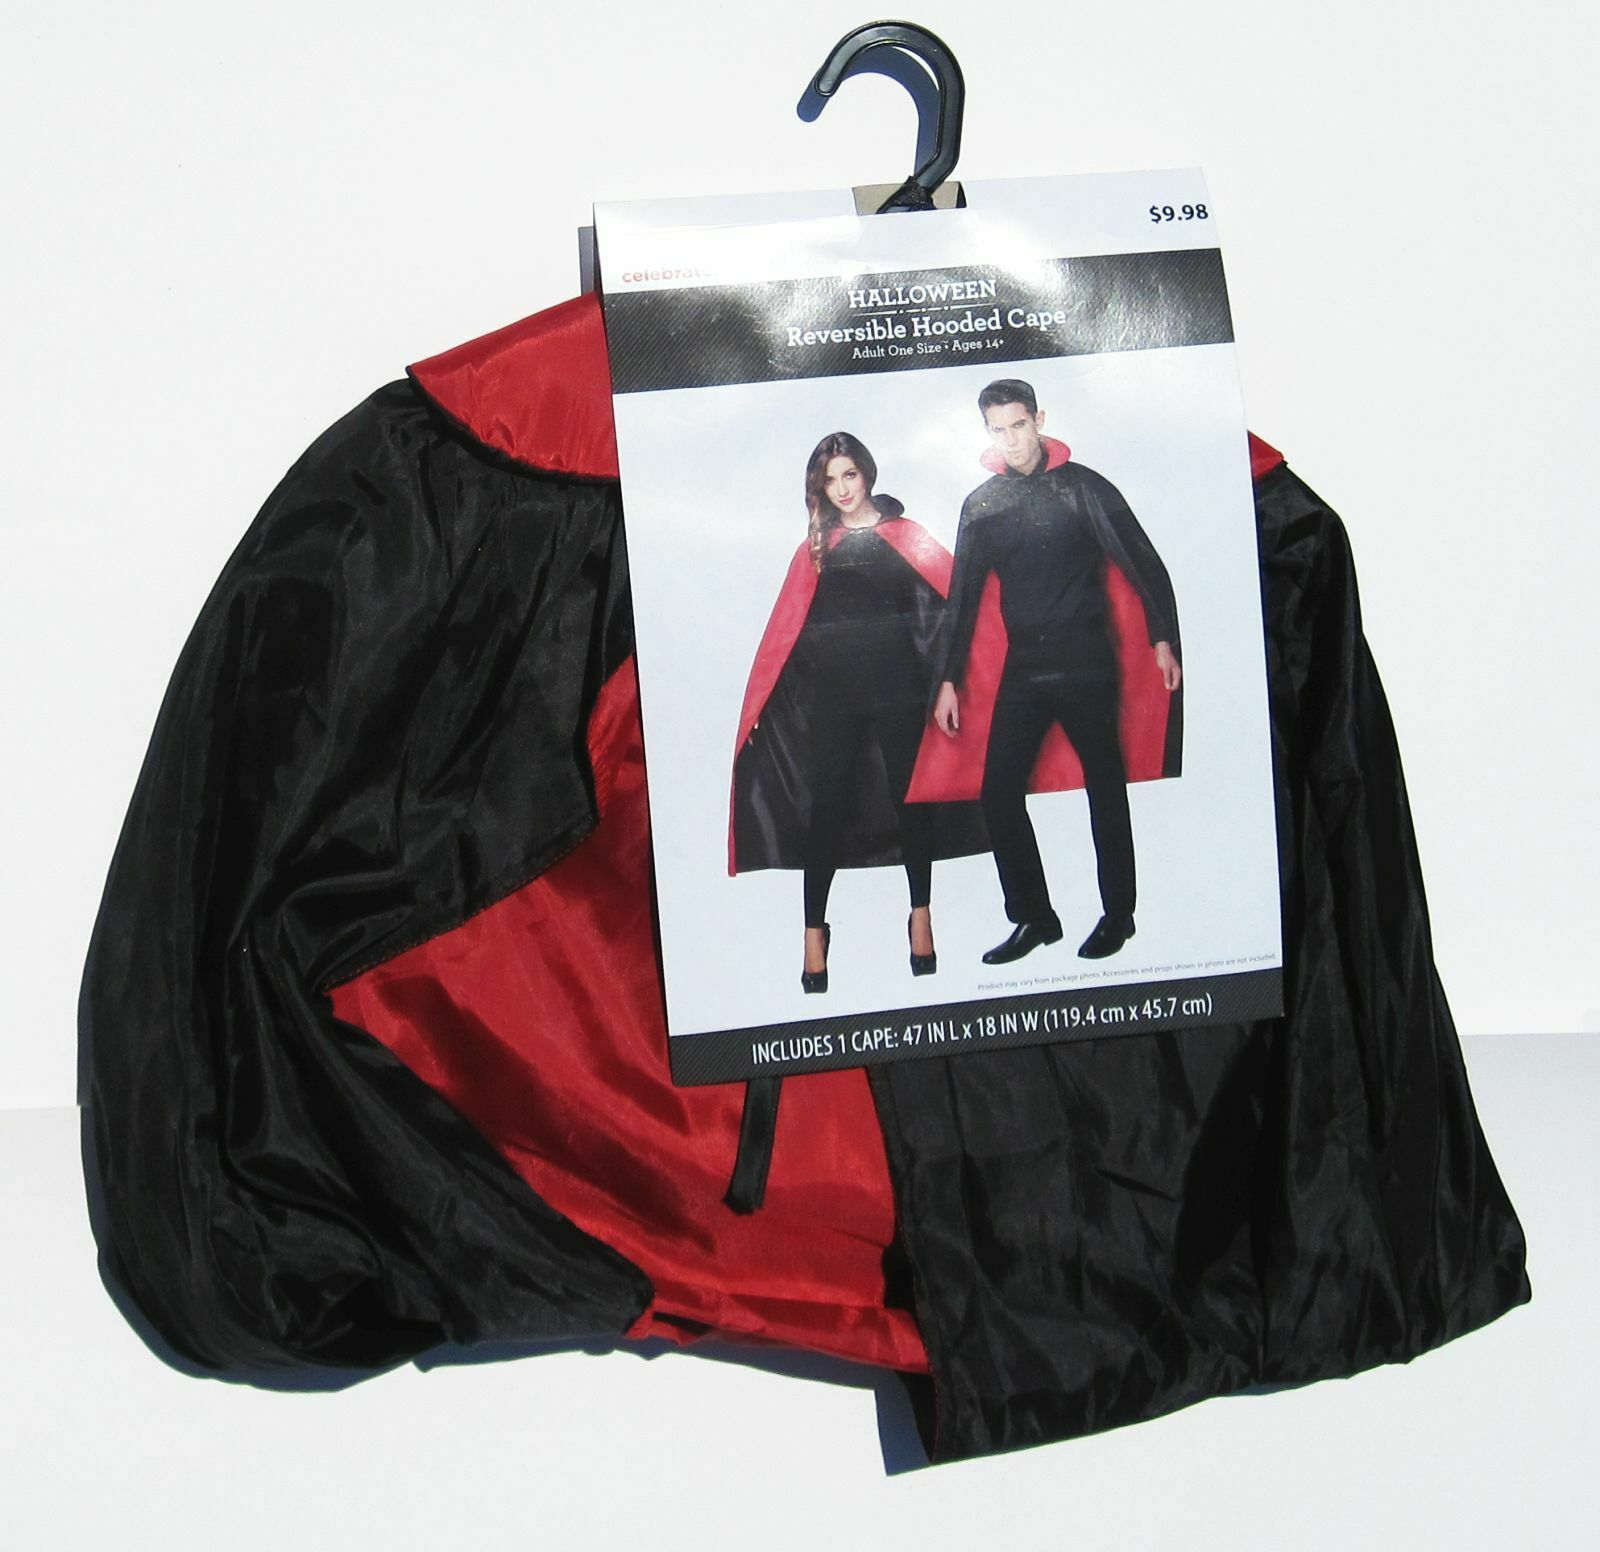 Hooded Vampire Cape Dracula Halloween Cosplay Costume Reversible Black Red NEW